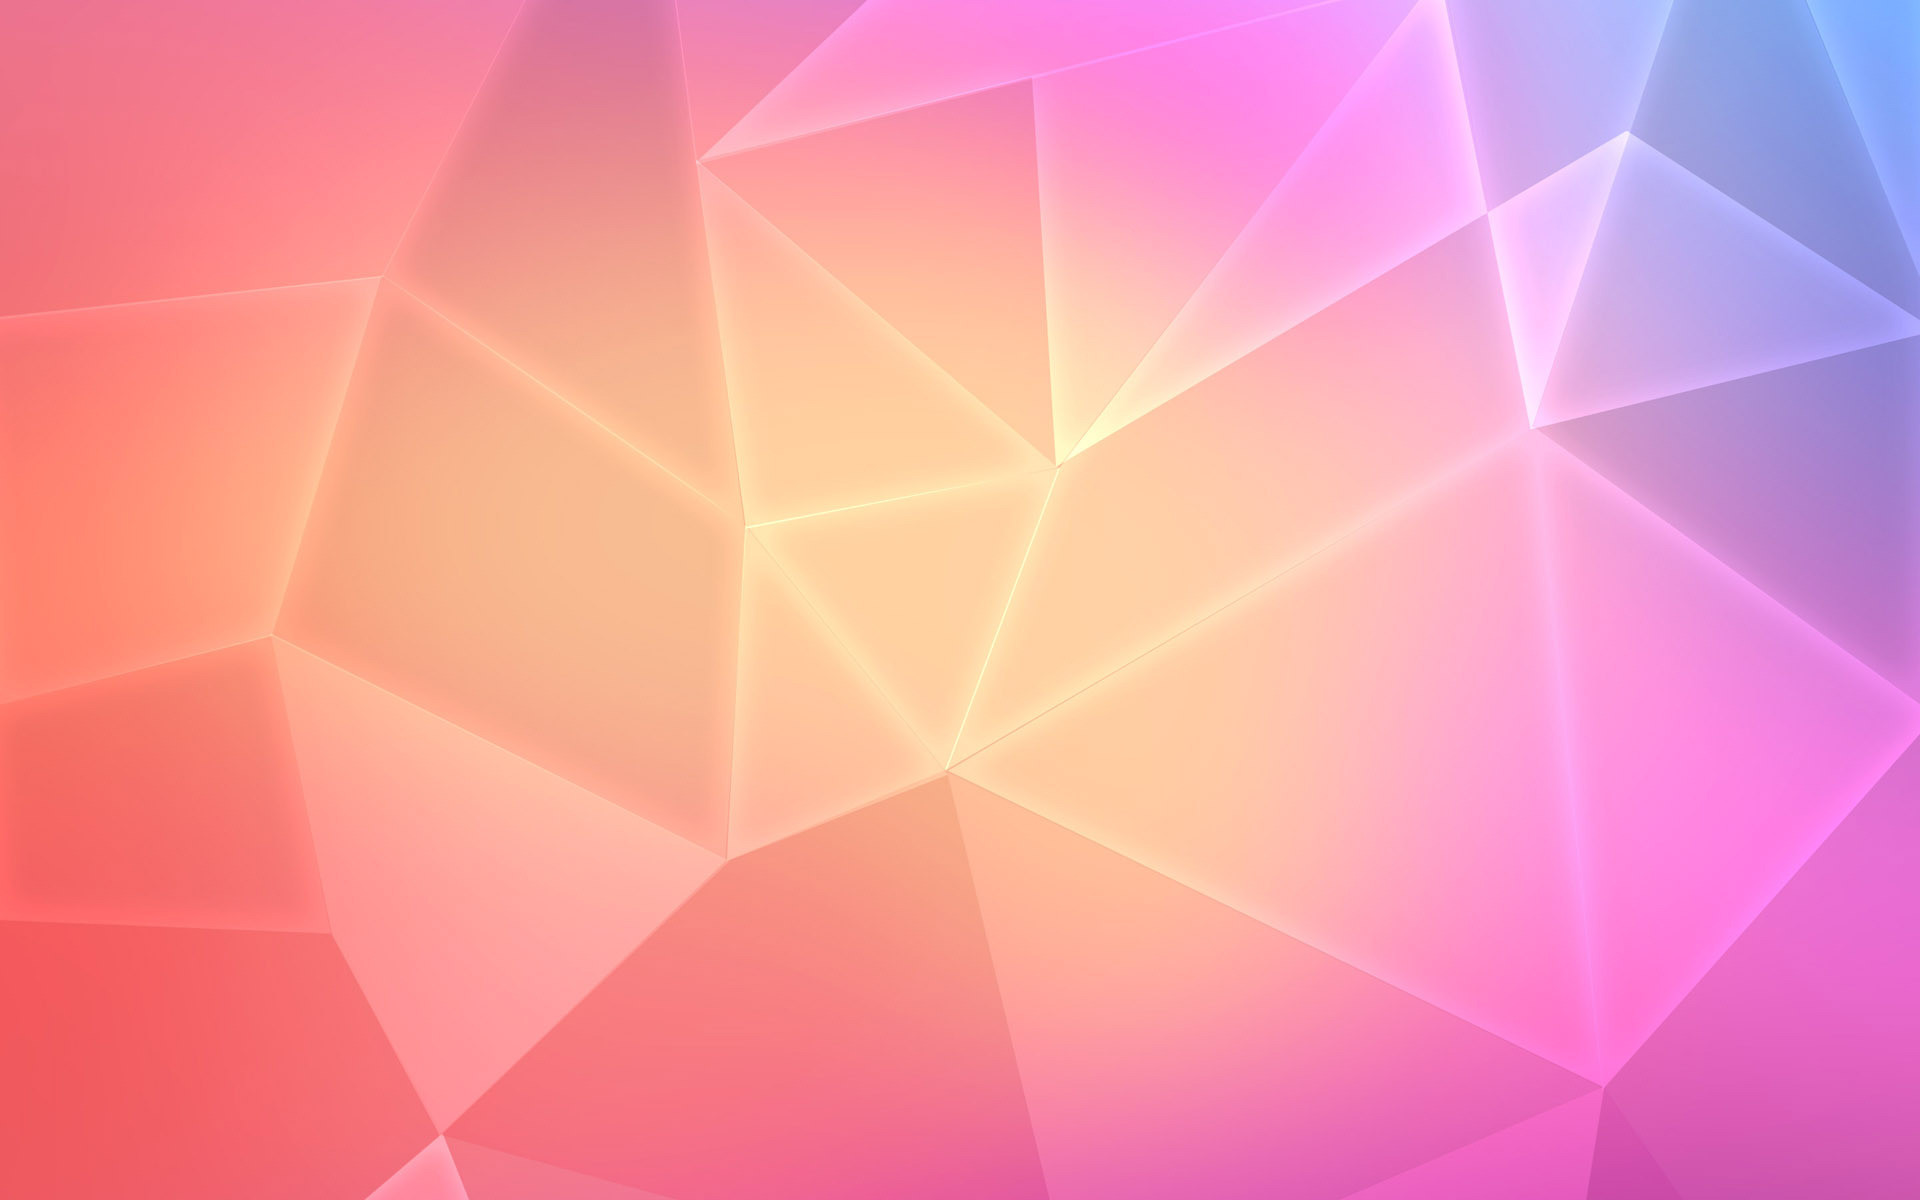 wonderful-geometric-wallpaper-45213-46410-hd-wallpapers